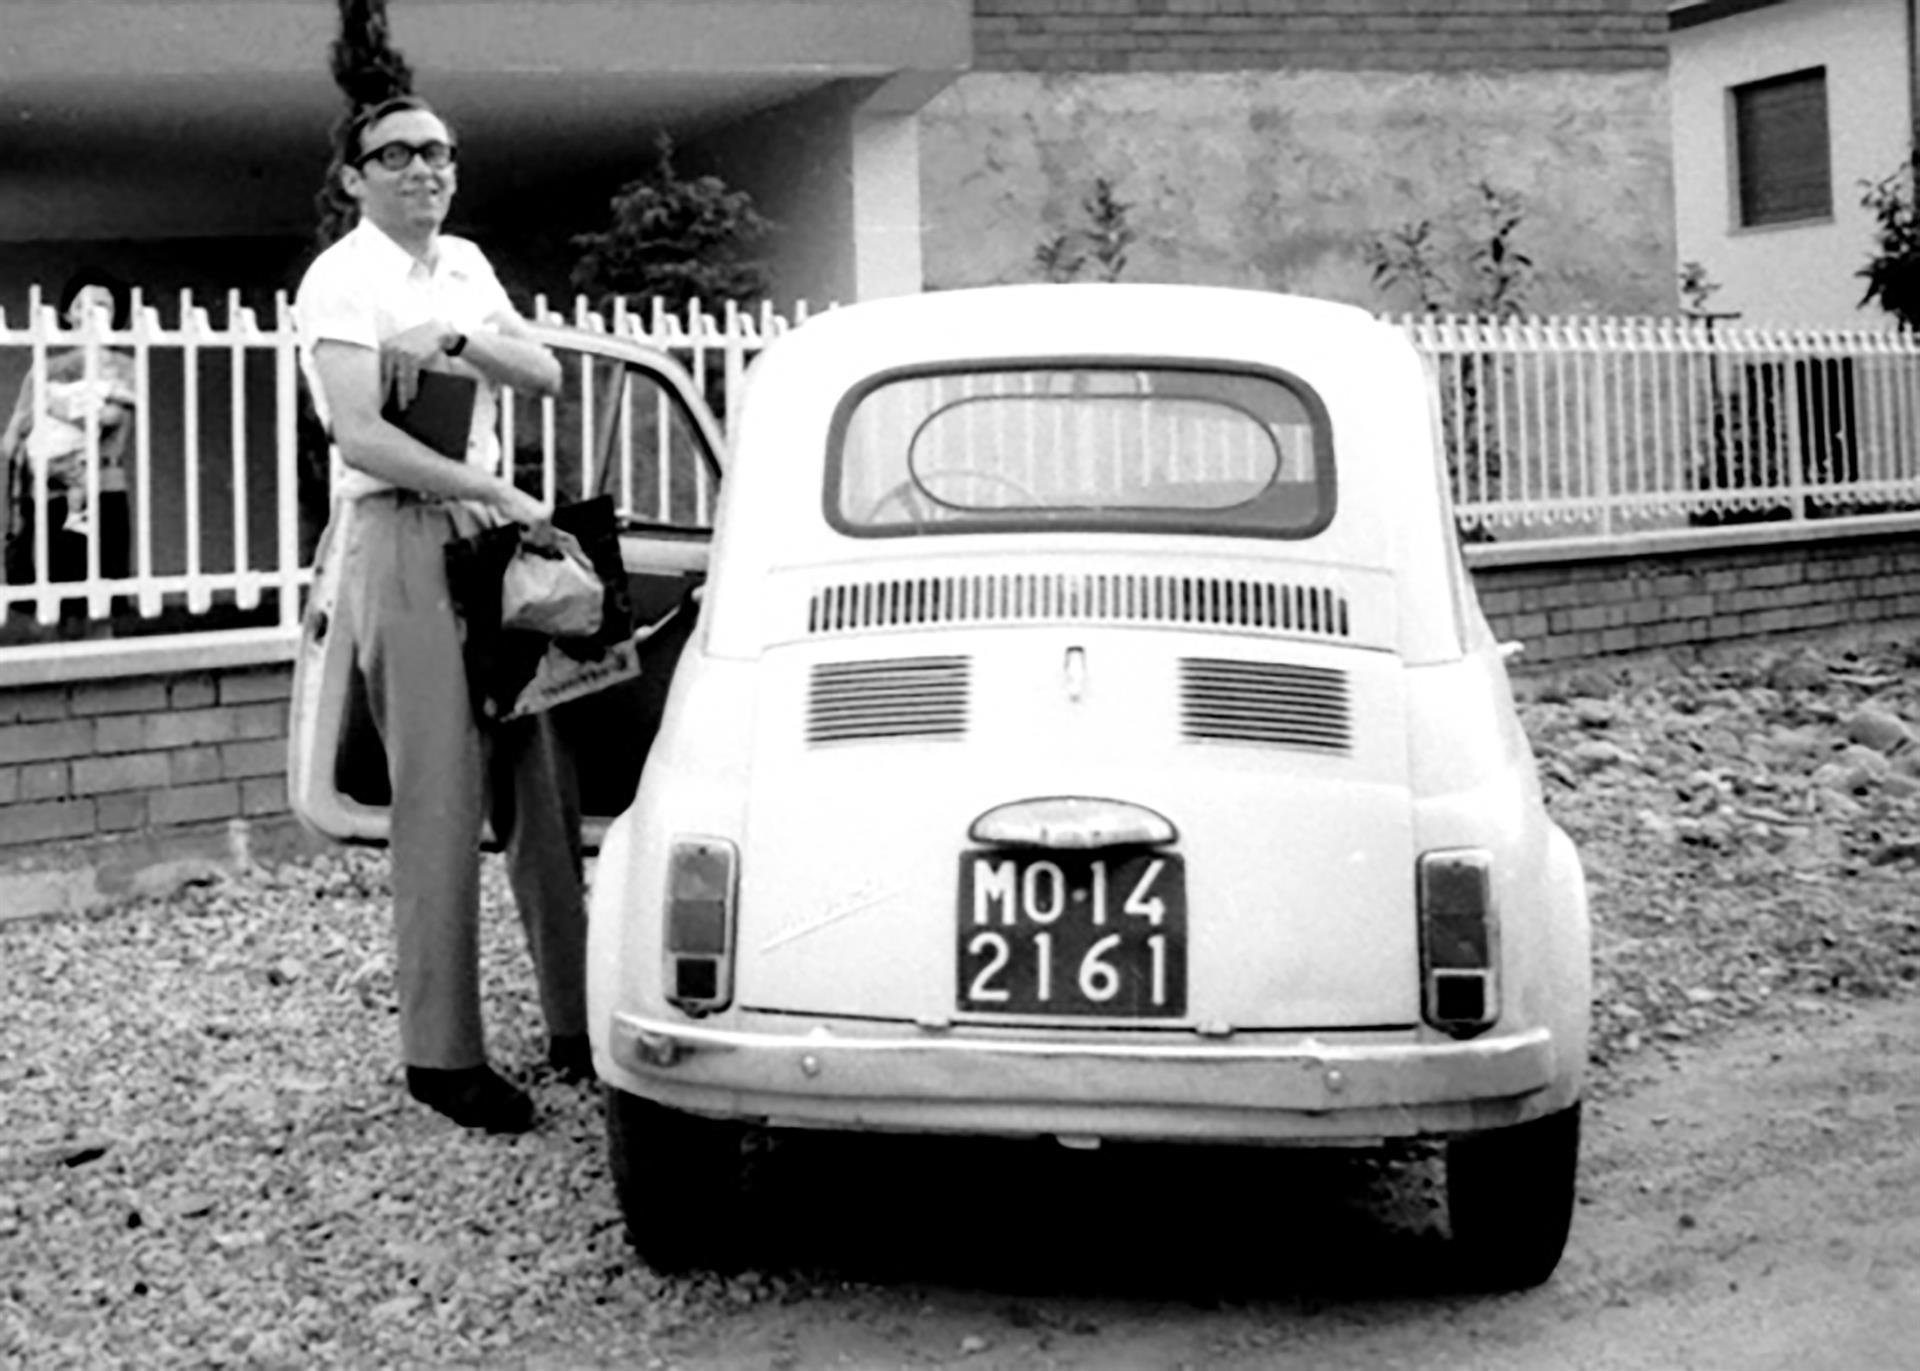 Franco Guerzoni, Luigi Ghirri, 1970